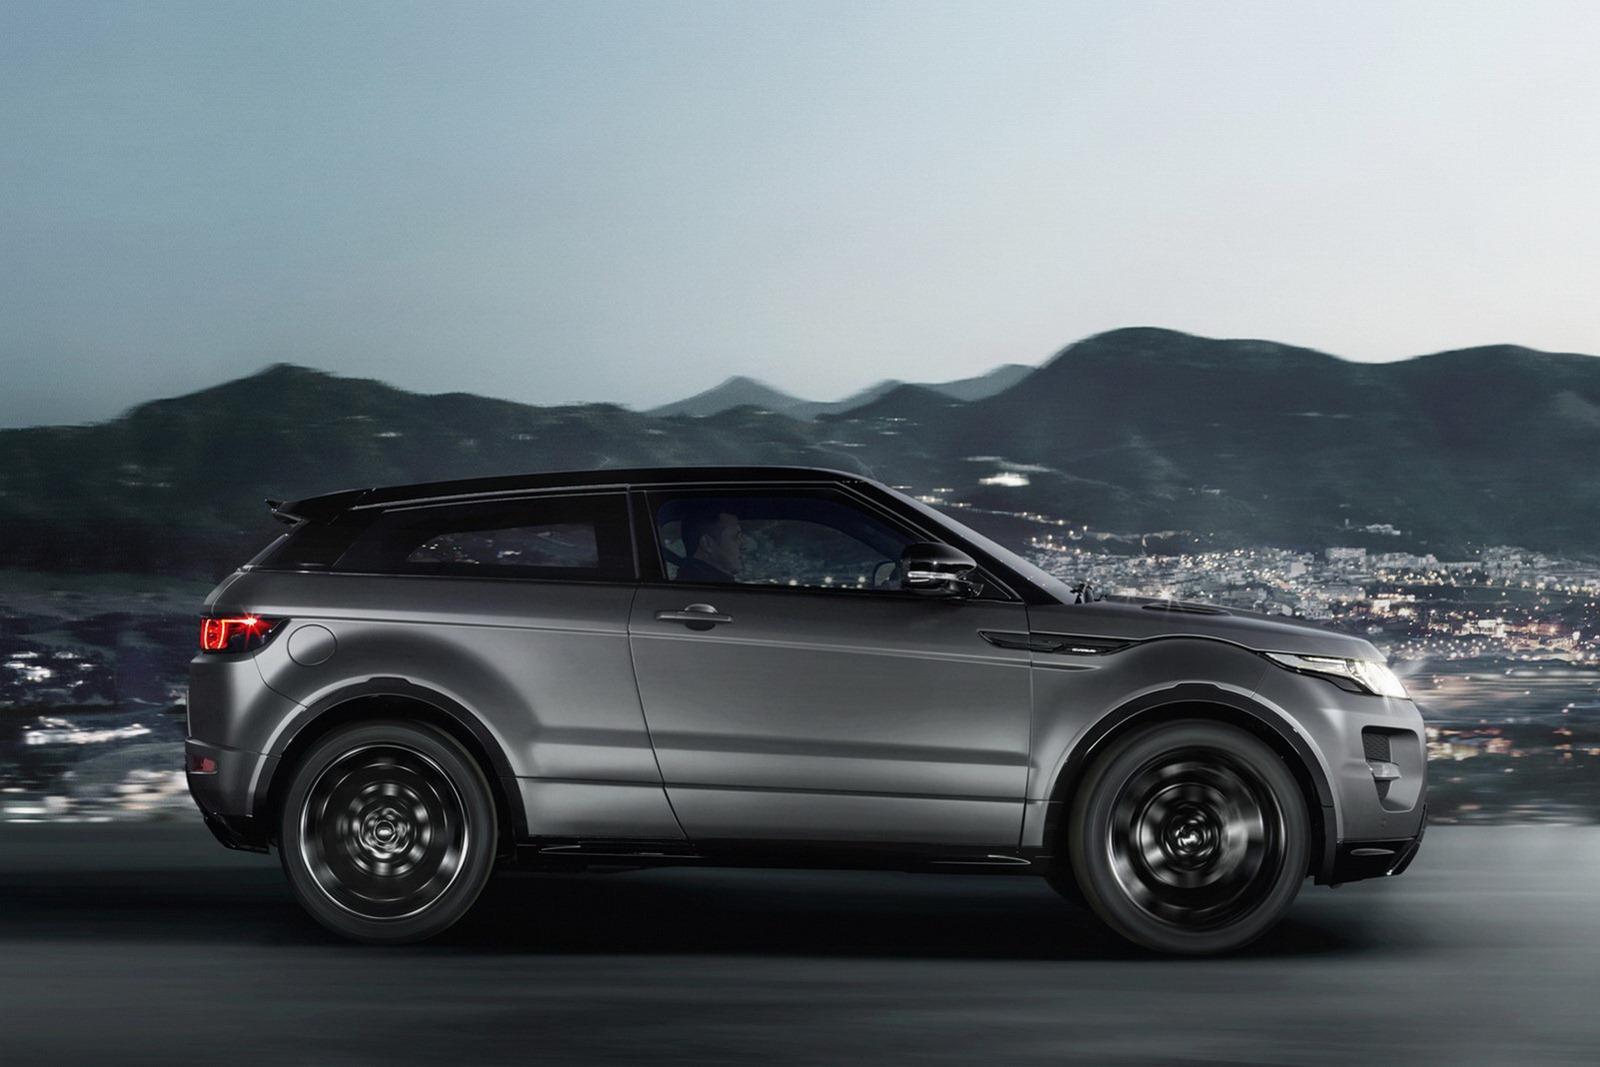 range rover evoque victoria beckham edition autoevolution. Black Bedroom Furniture Sets. Home Design Ideas